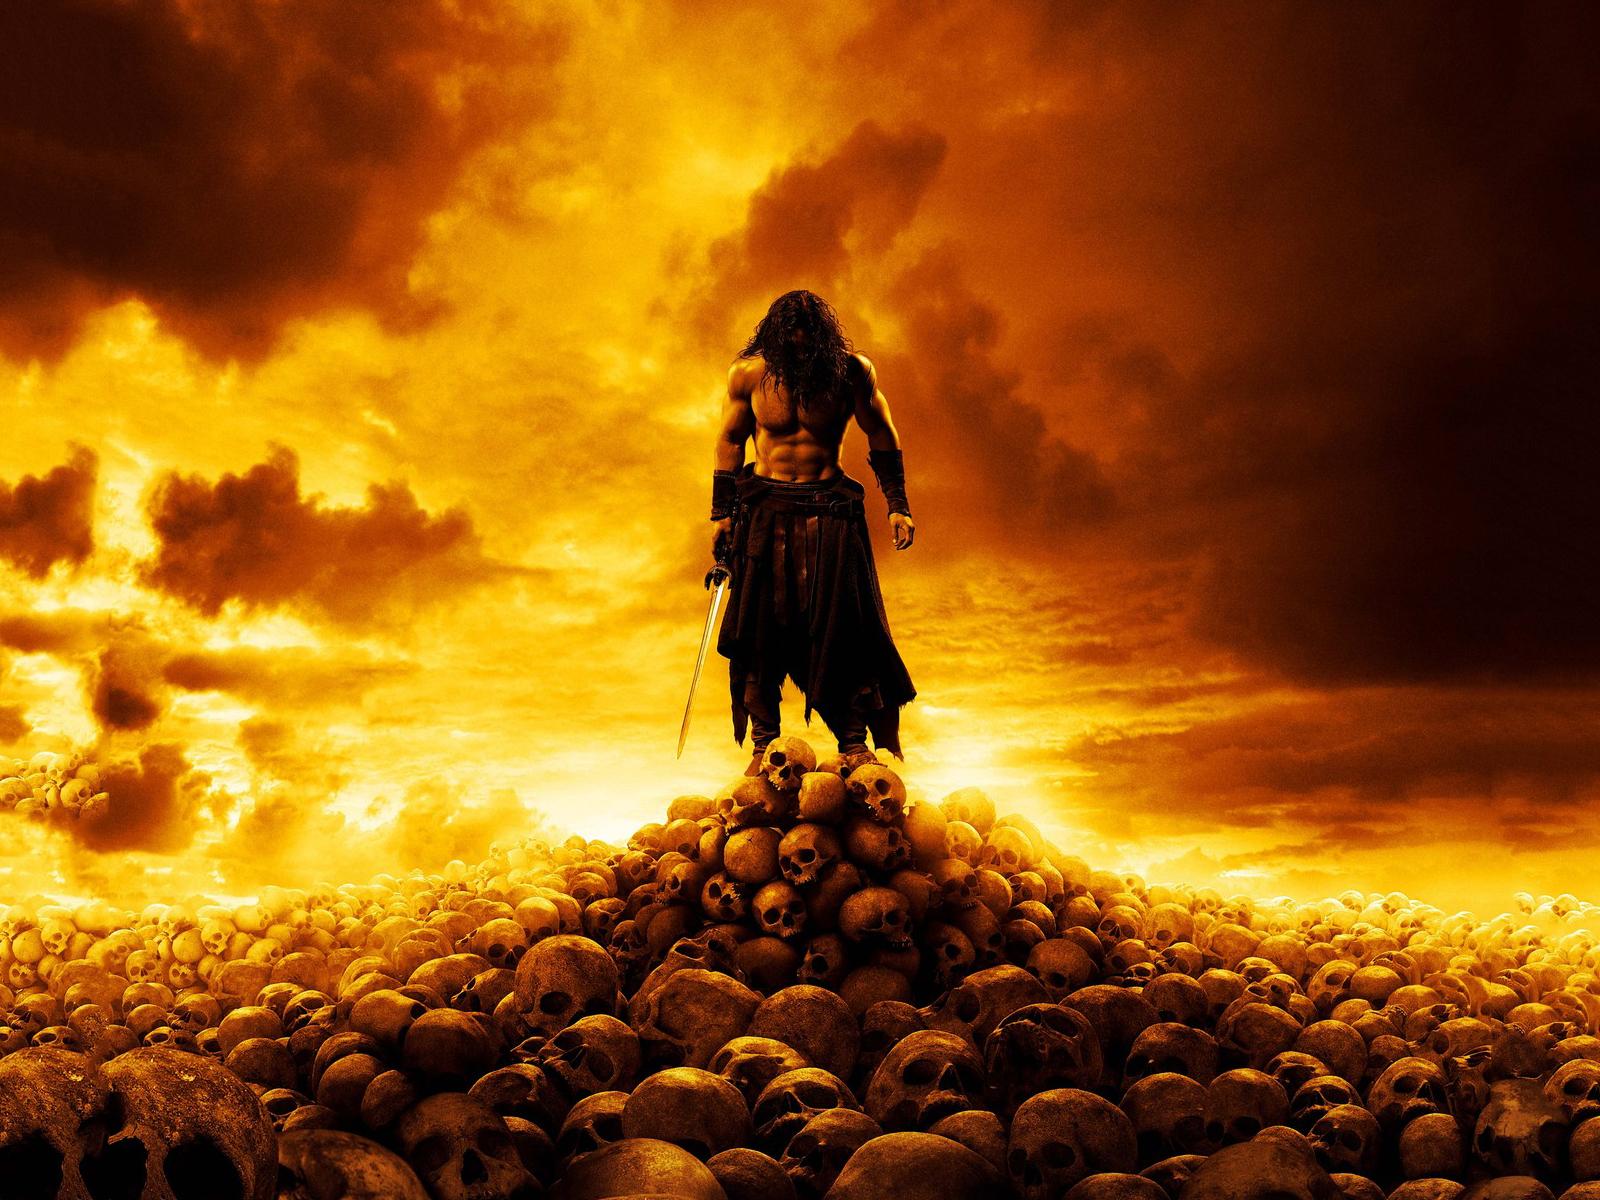 Conan The Barbarian Wallpapers 1600x1200 1600x1200